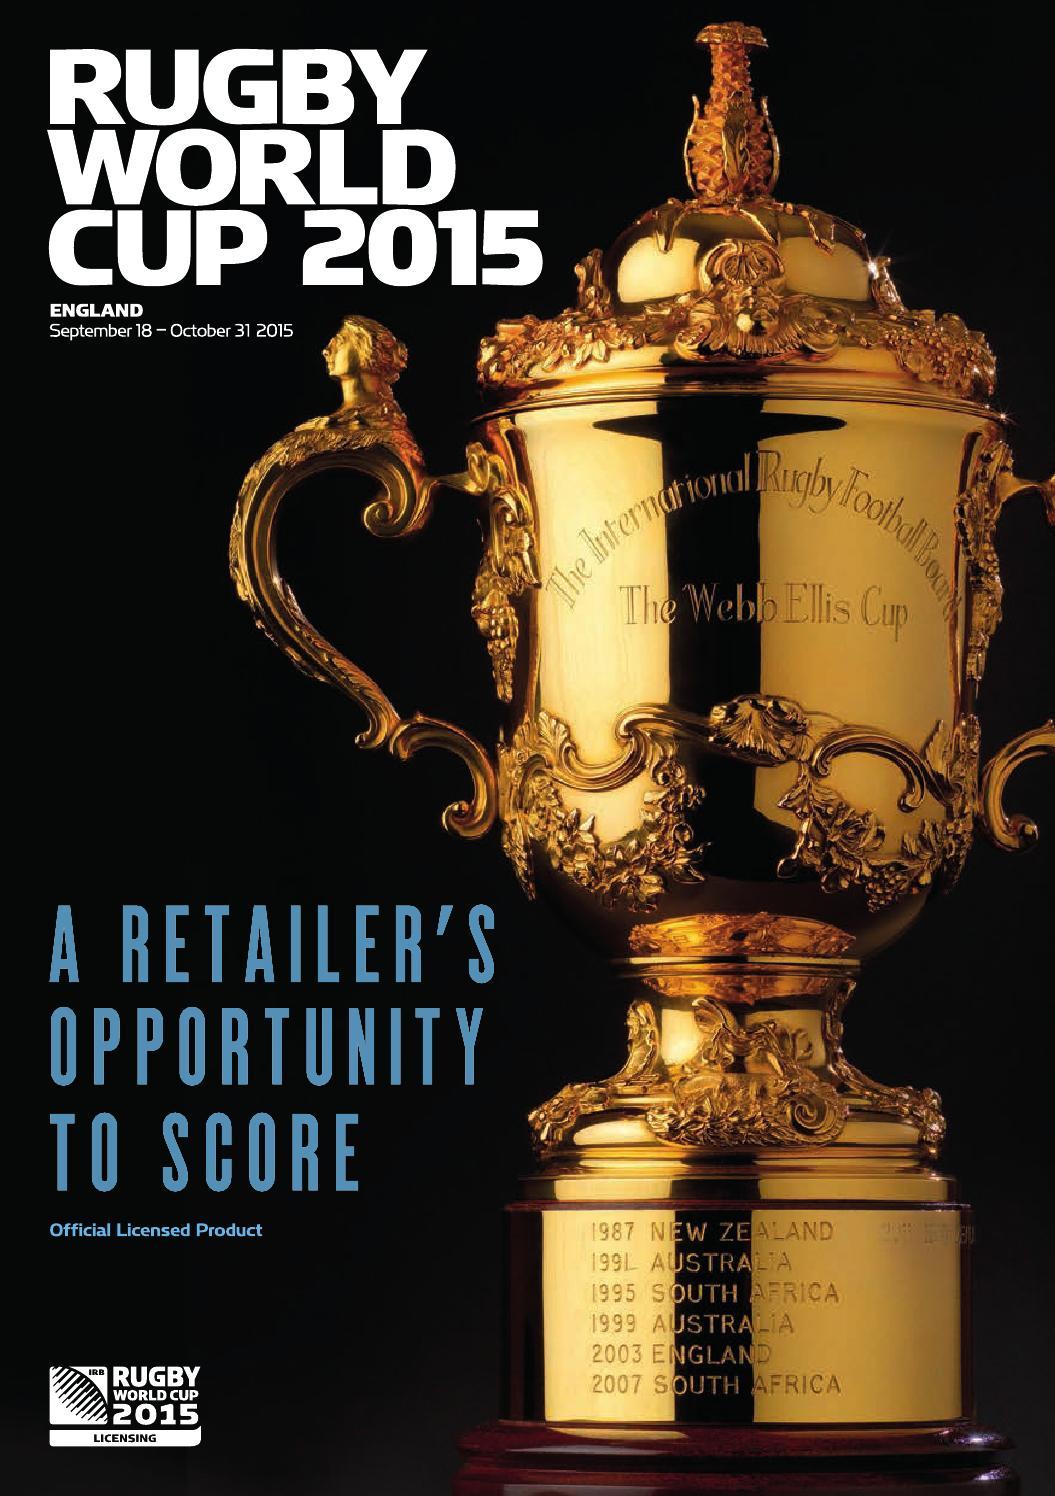 Rugby World Cup 2015 Shaun the Sheep Lanyard